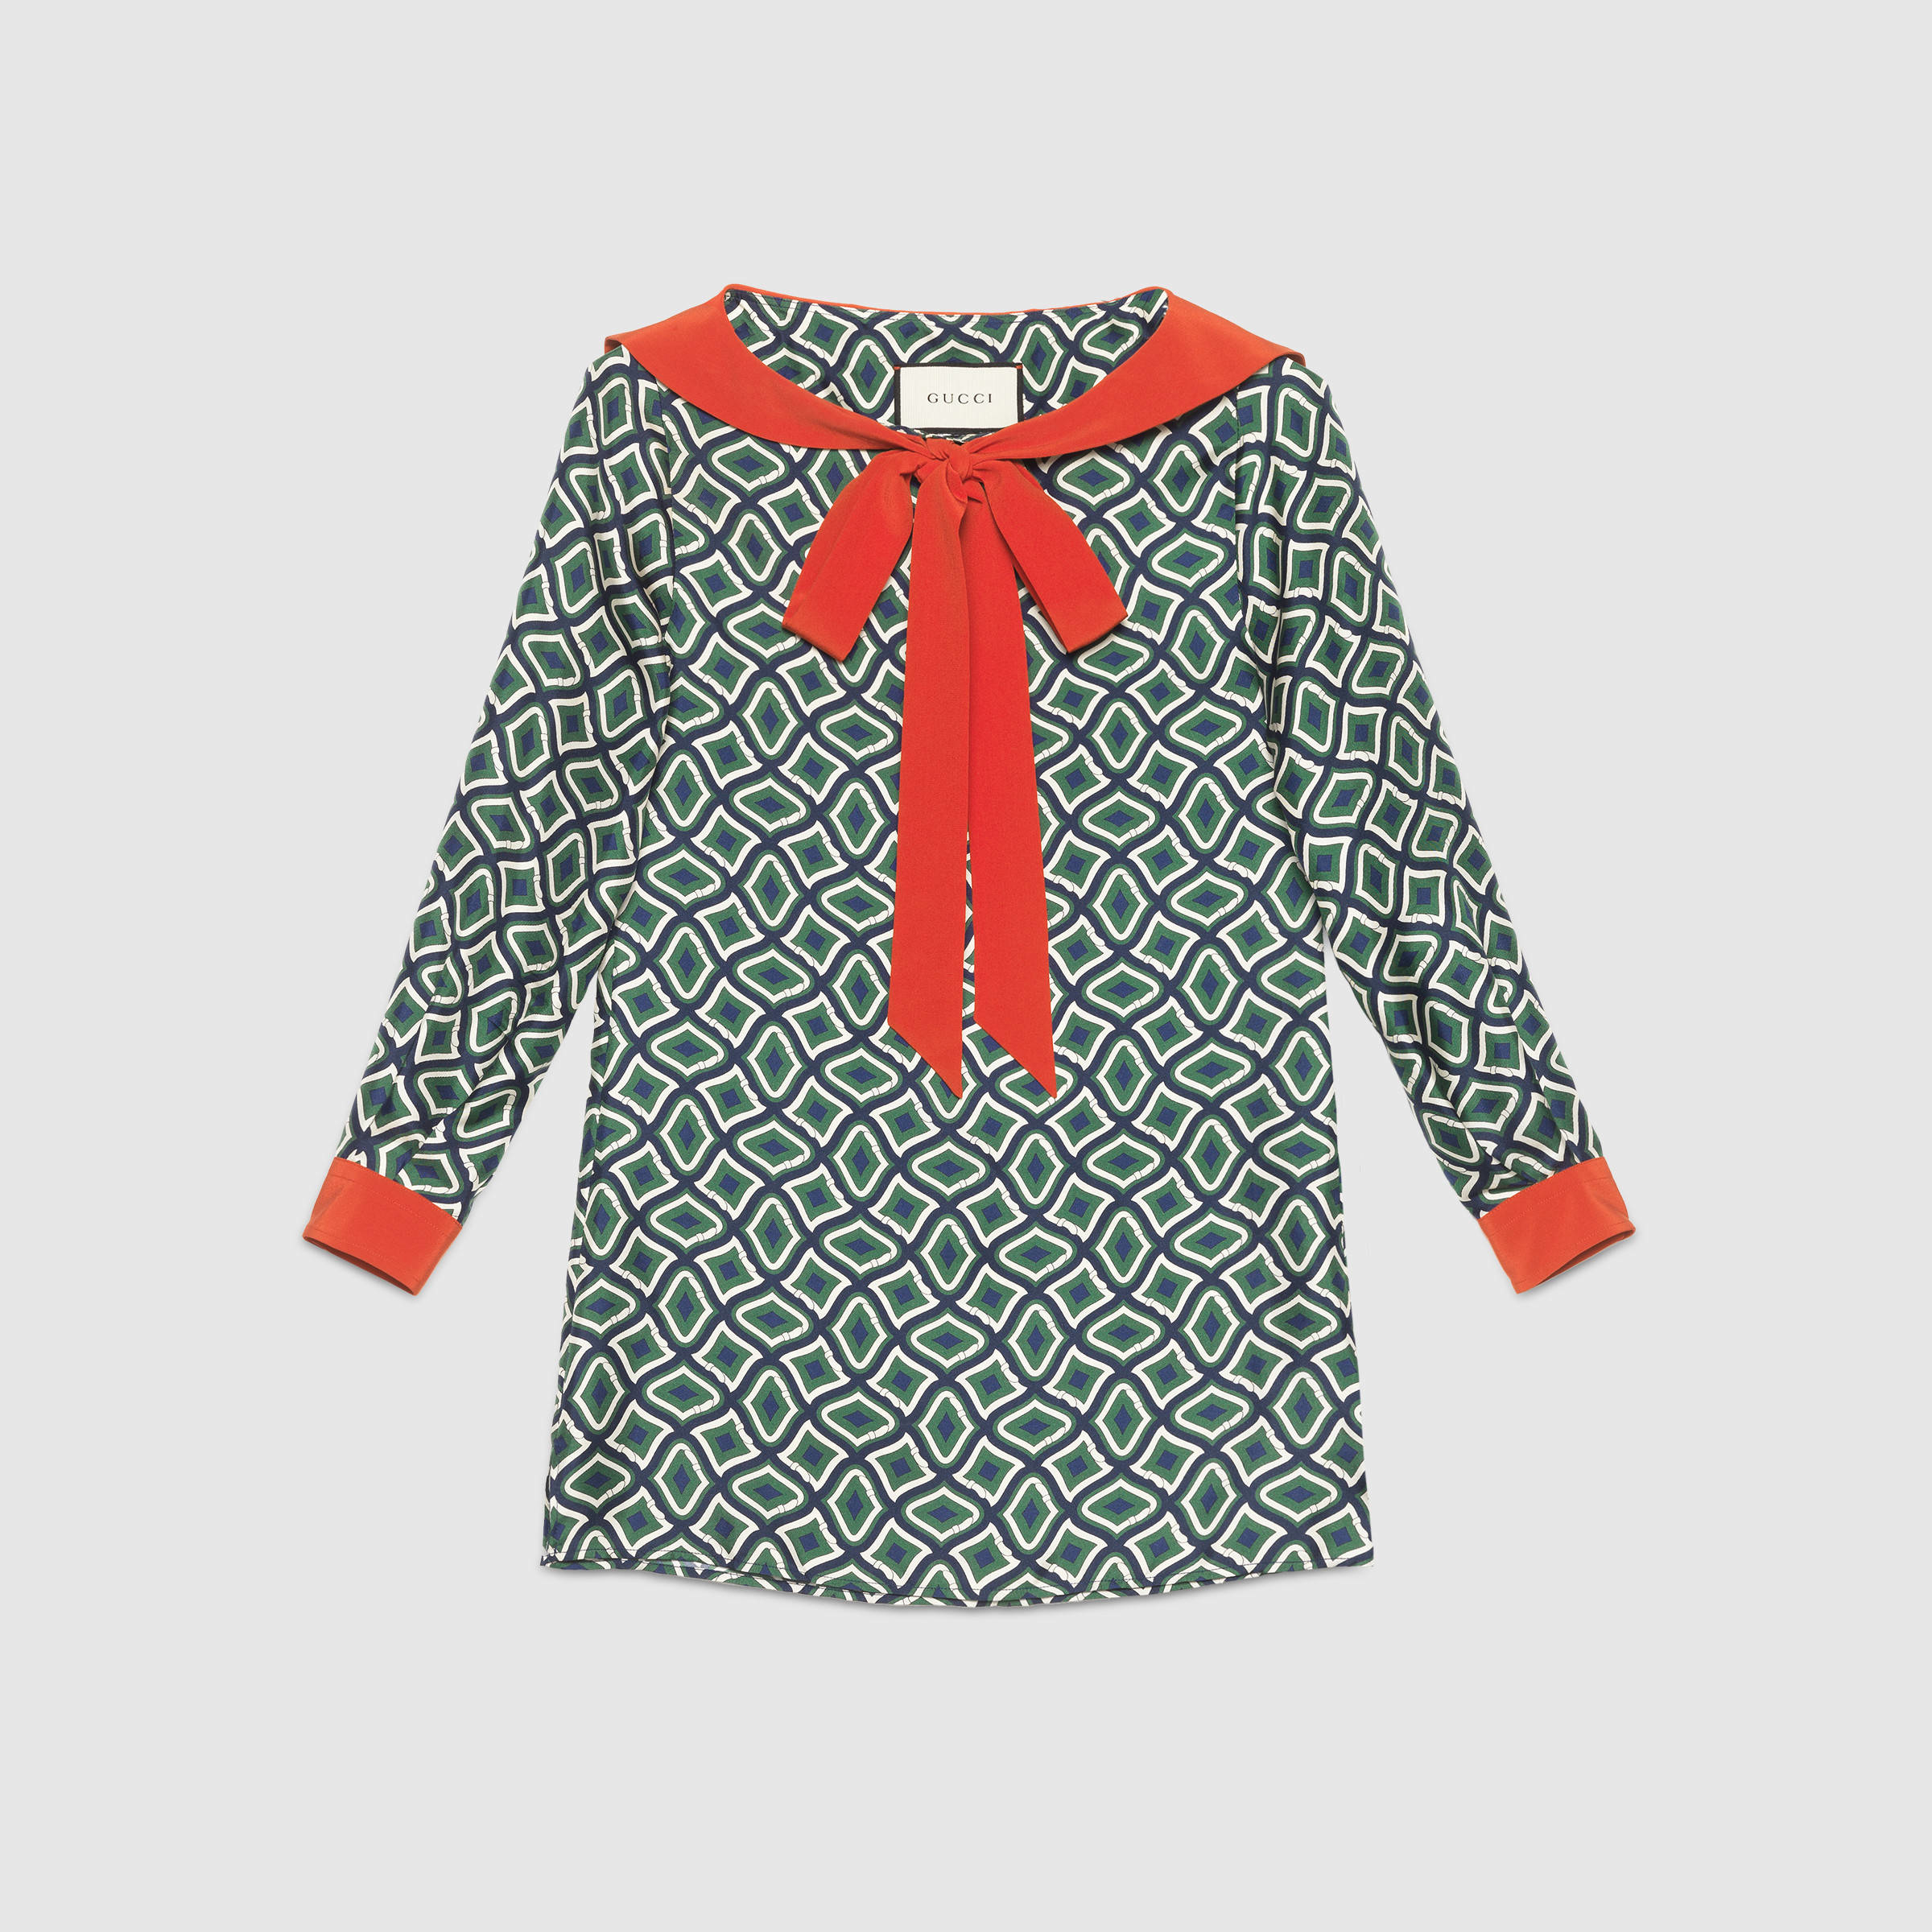 dcb72d900bbc2 Lyst - Gucci Geometric Print Silk Sailor Shirt